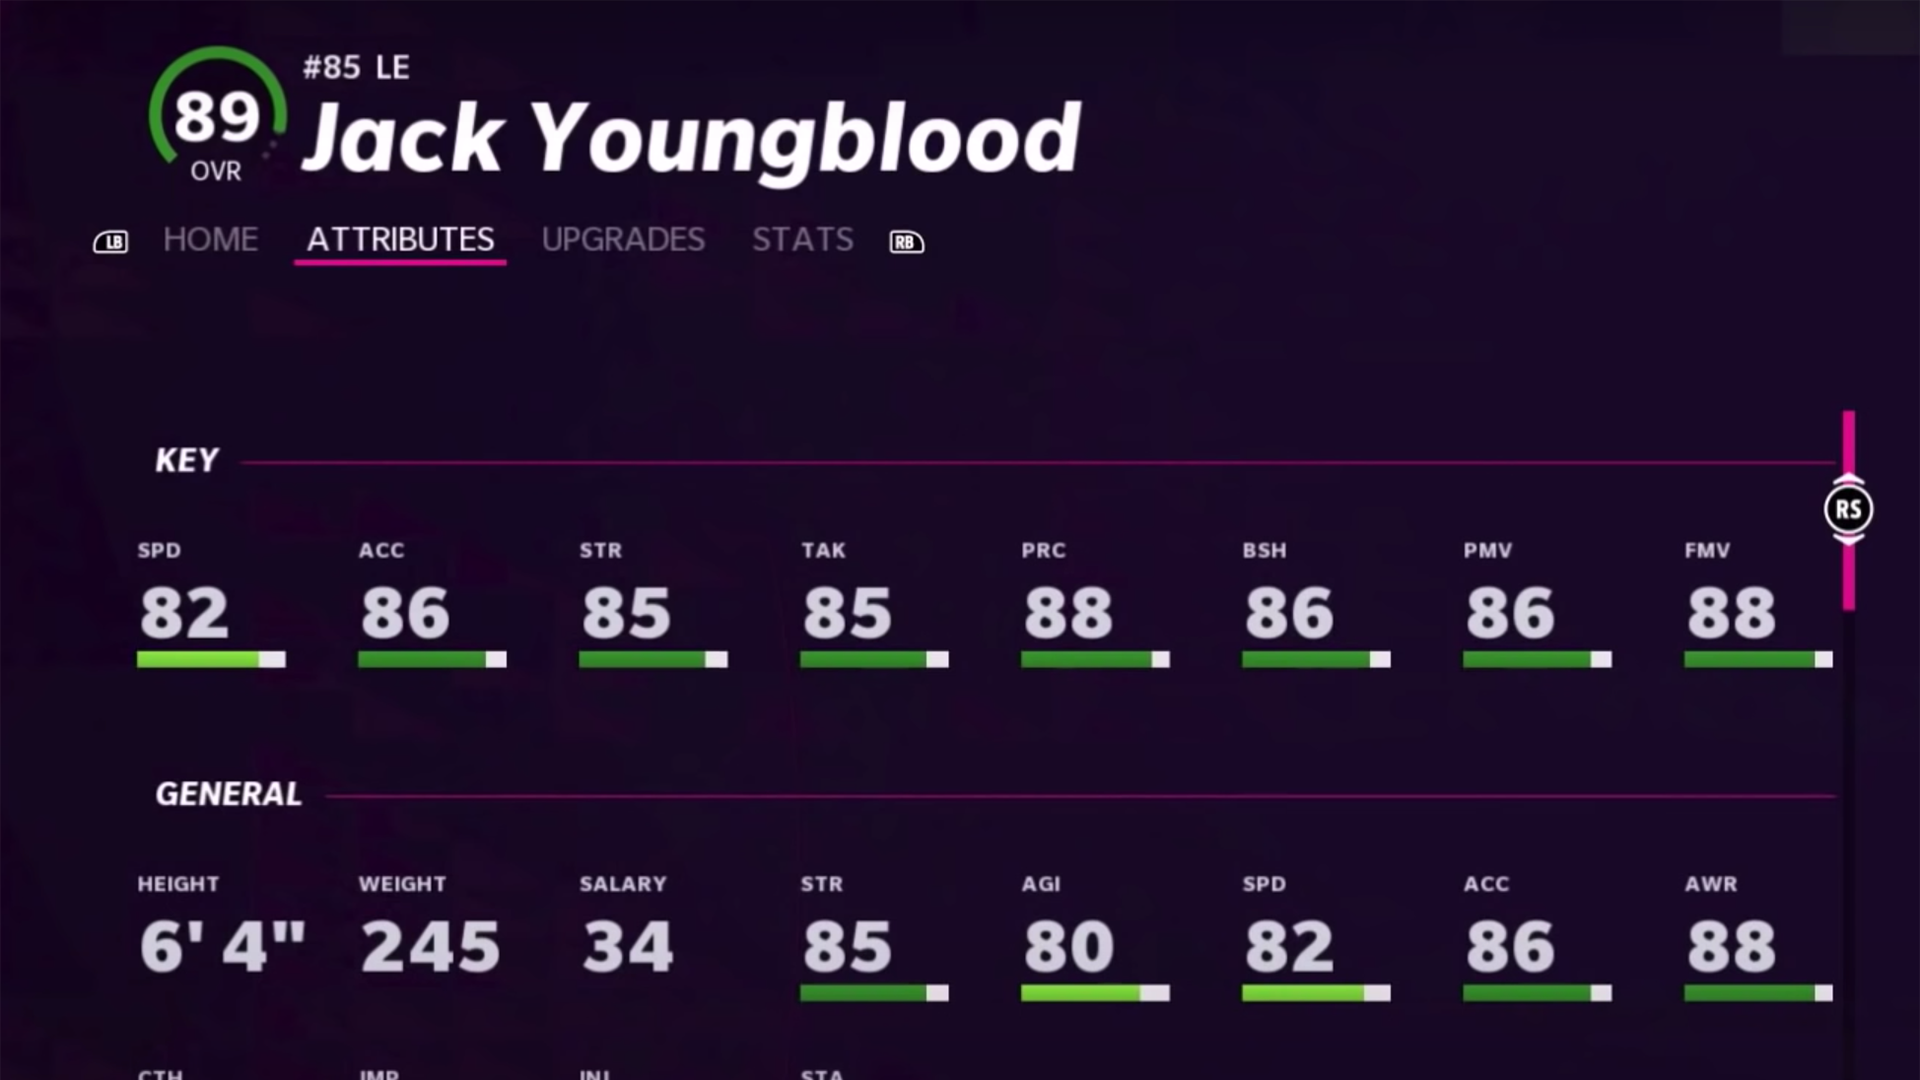 jack youngblood 15rq8sgeqb6ka1orb8w82r2nfq